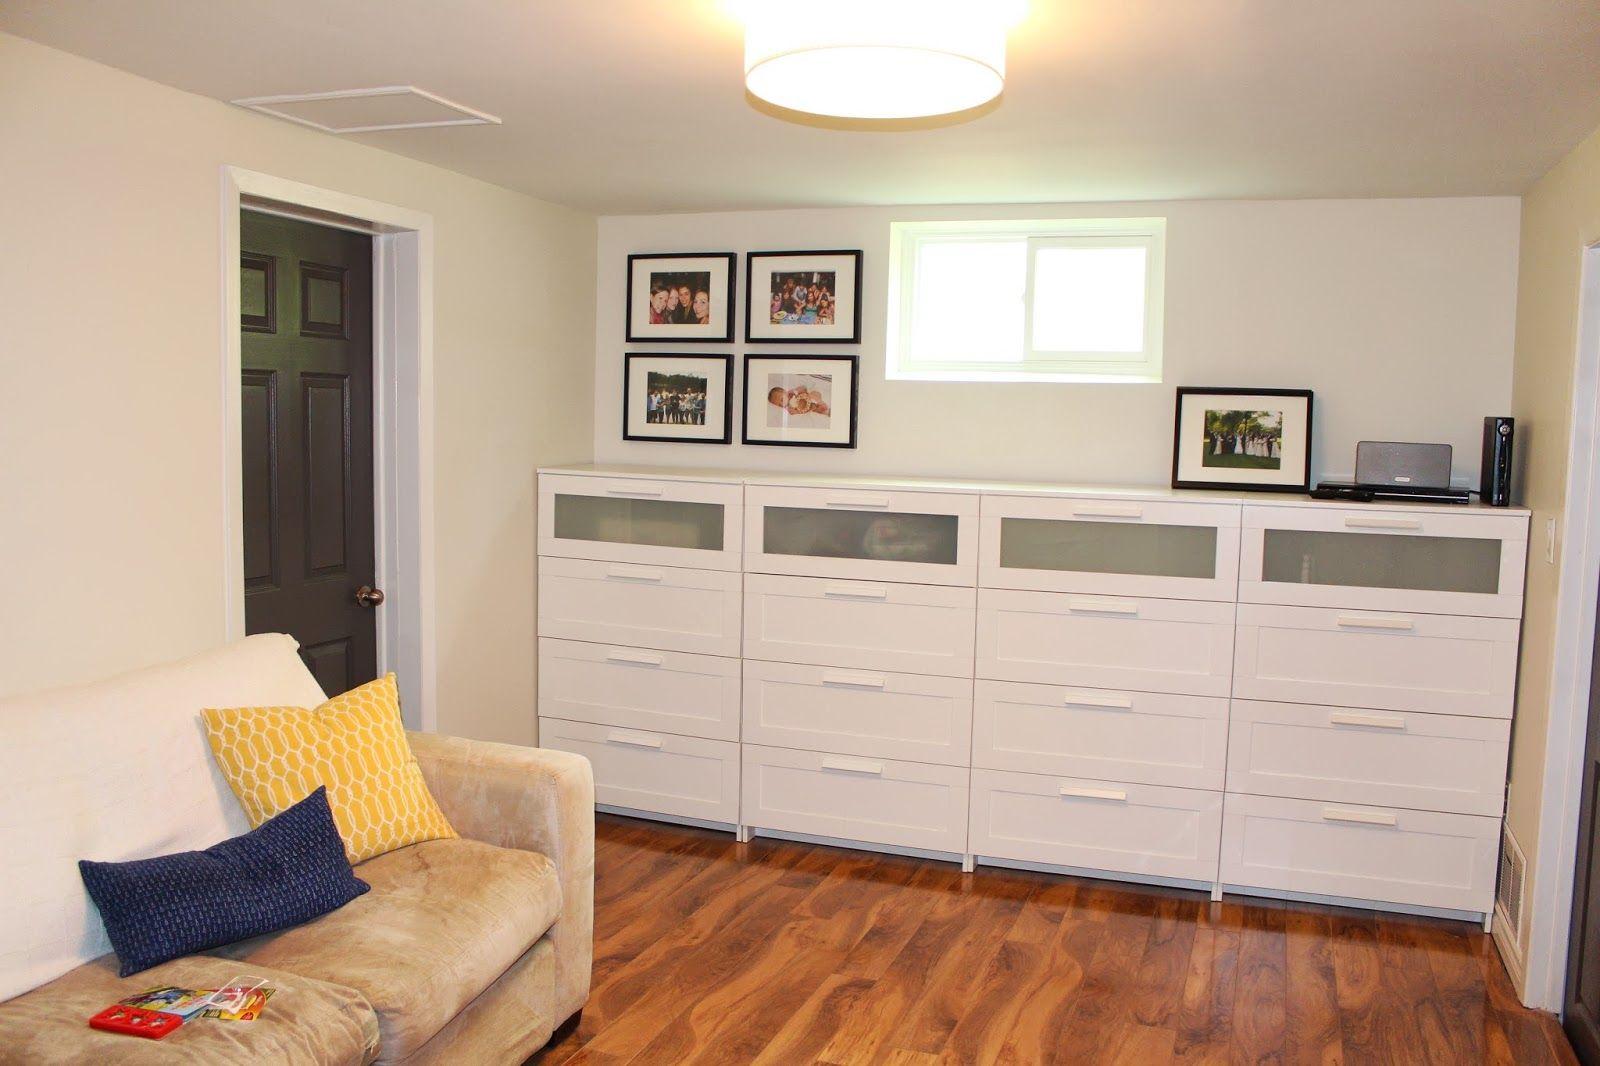 Ikea Brimnes Cabs Master Bedroom Ideas Pinterest Mobilier De Salon